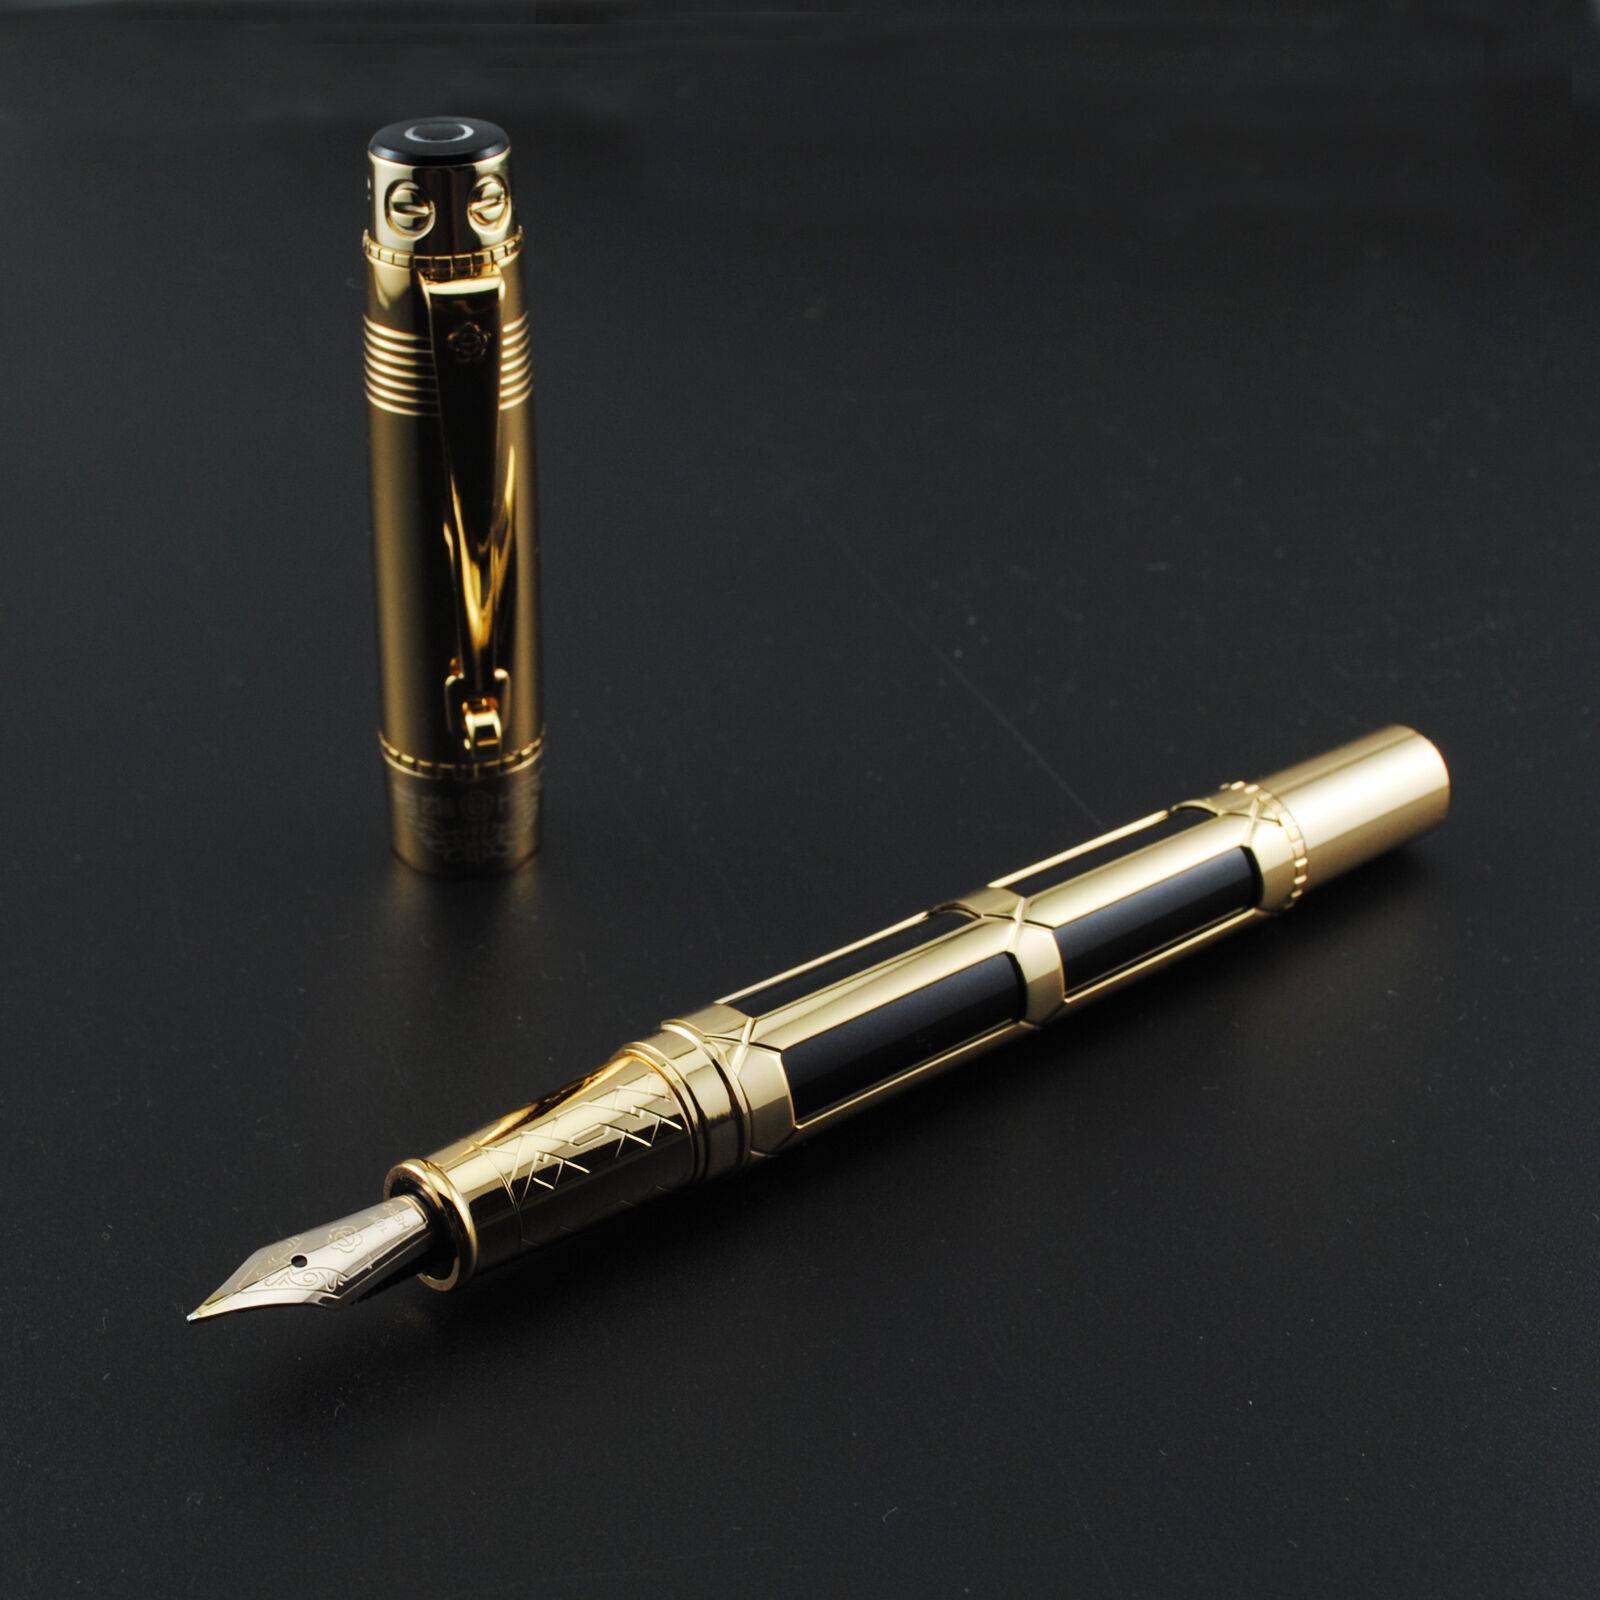 Old Stock WingSung Wing Sung Fountain Pen Ink Pen Metal Pen Stationery Office School Supplies Penna Stilografica